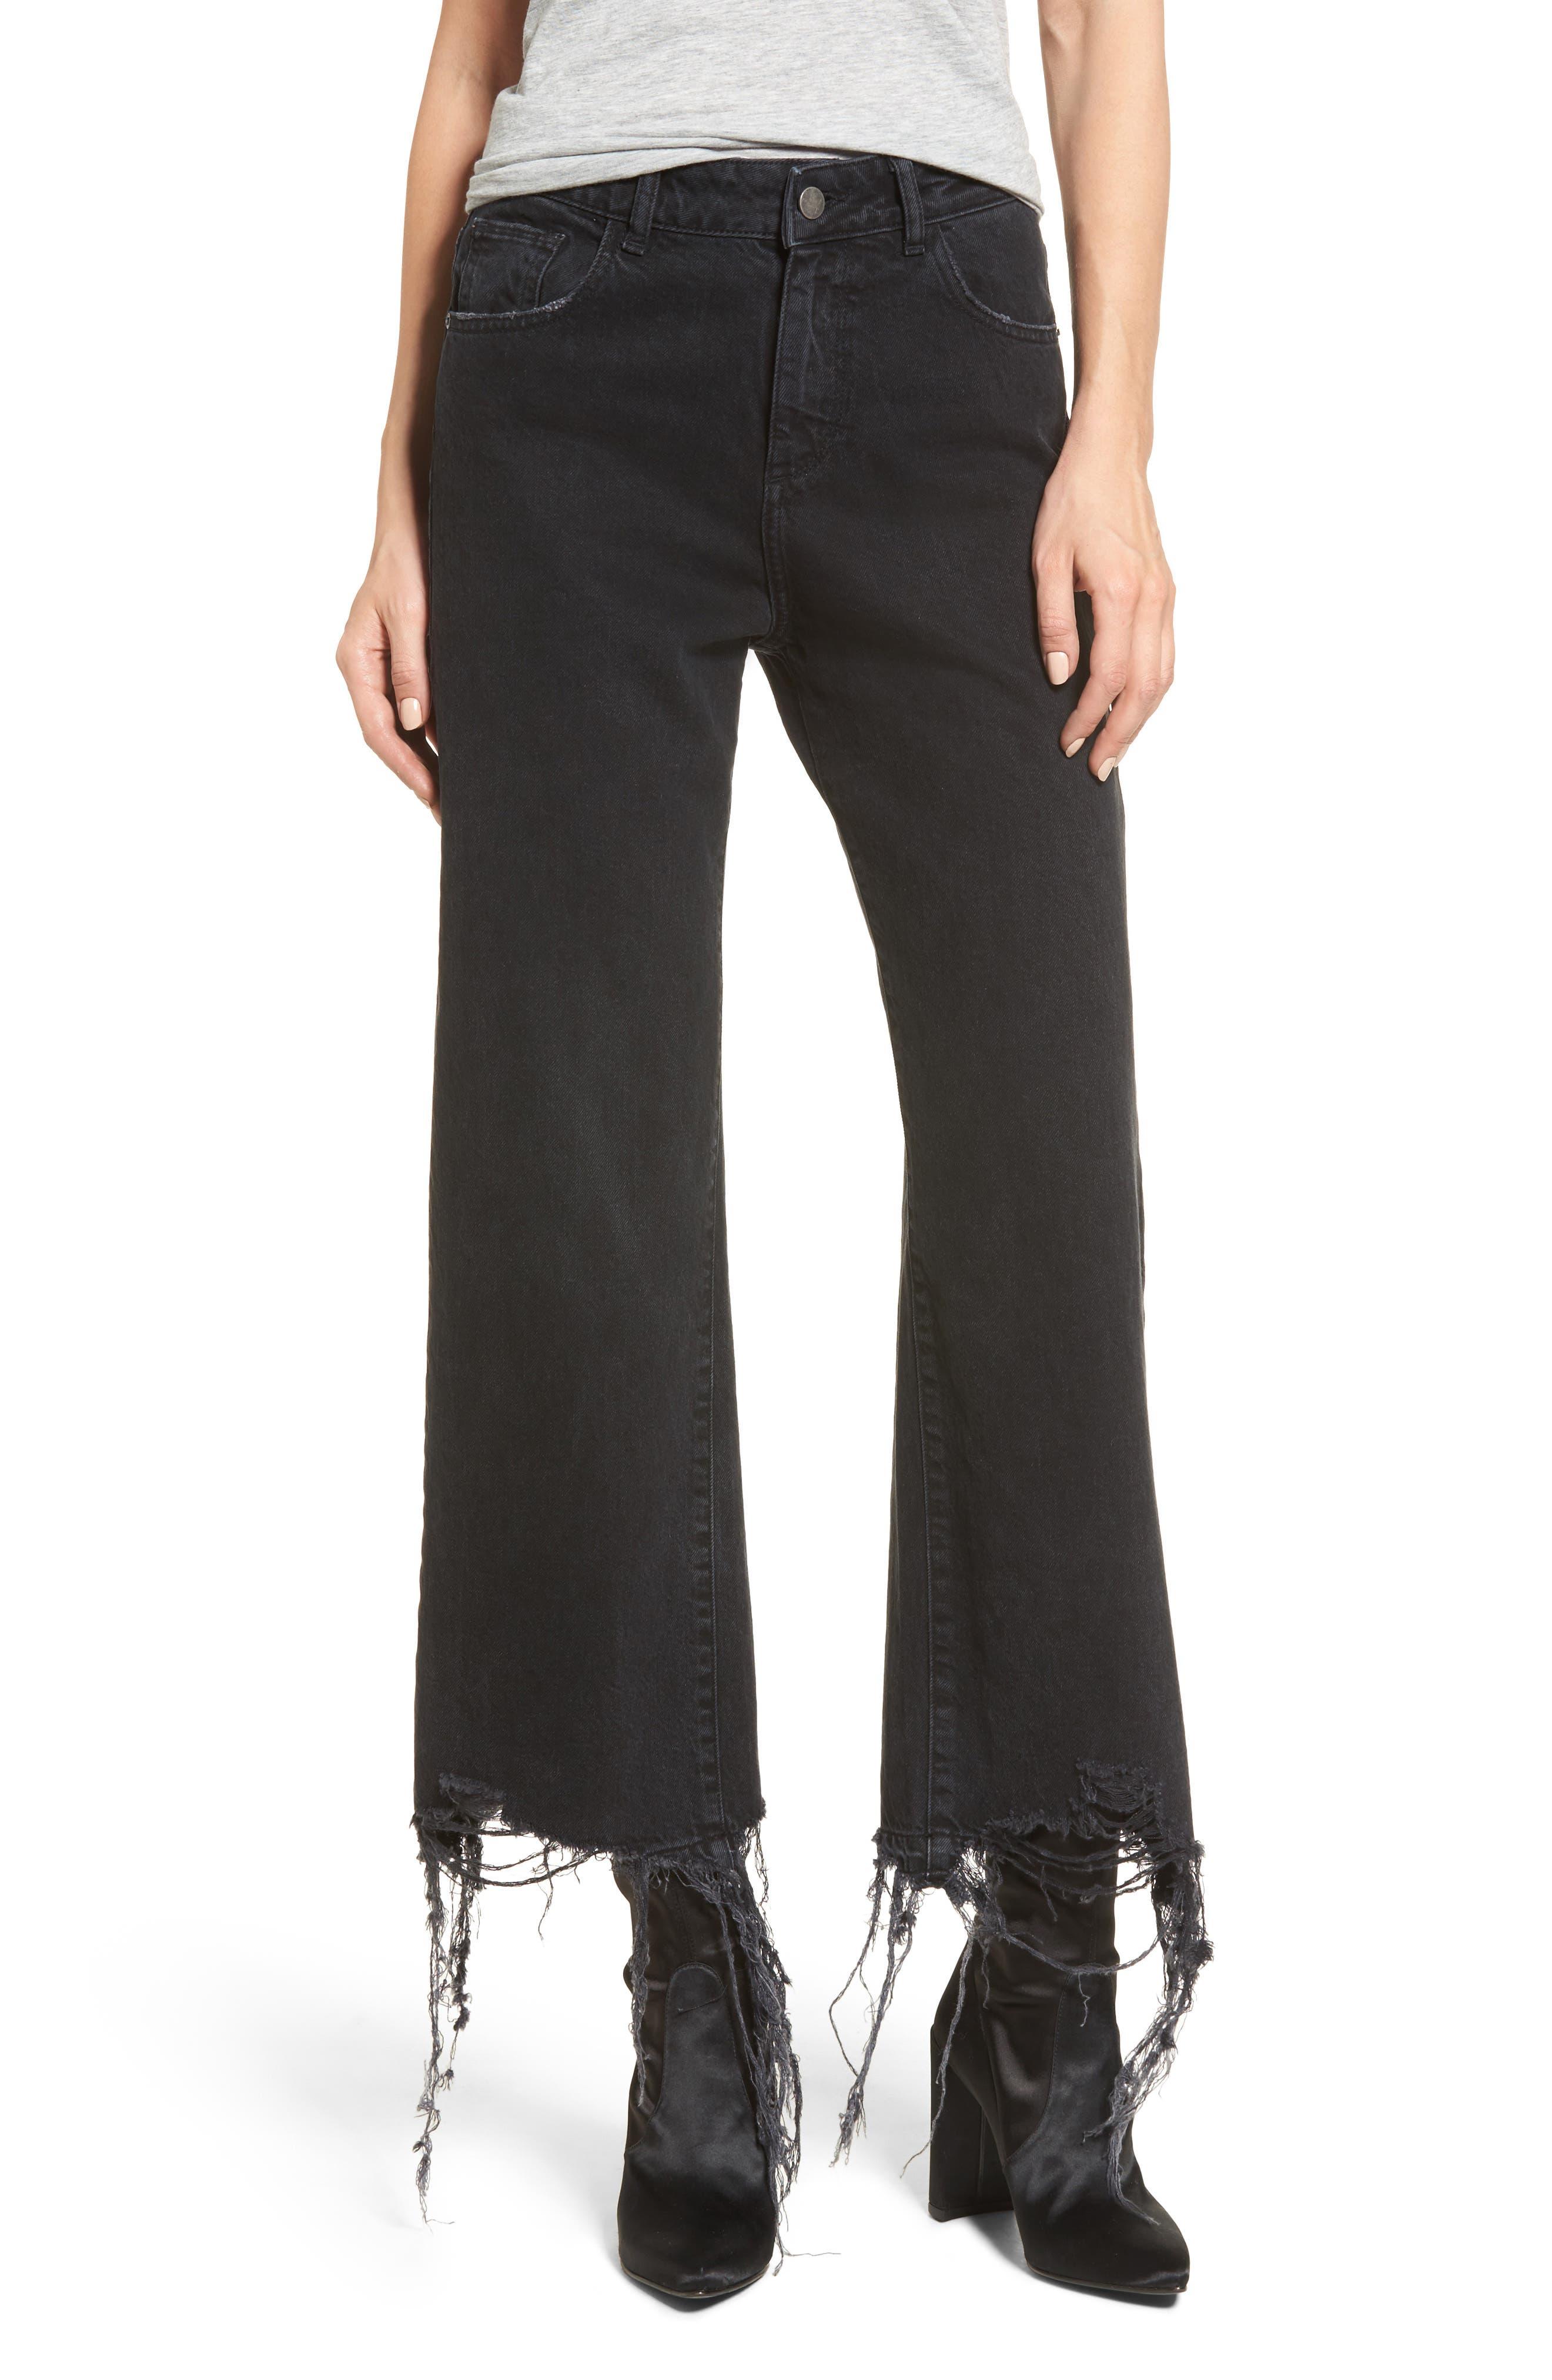 Hepburn High Waist Wide Leg Jeans,                         Main,                         color, 020